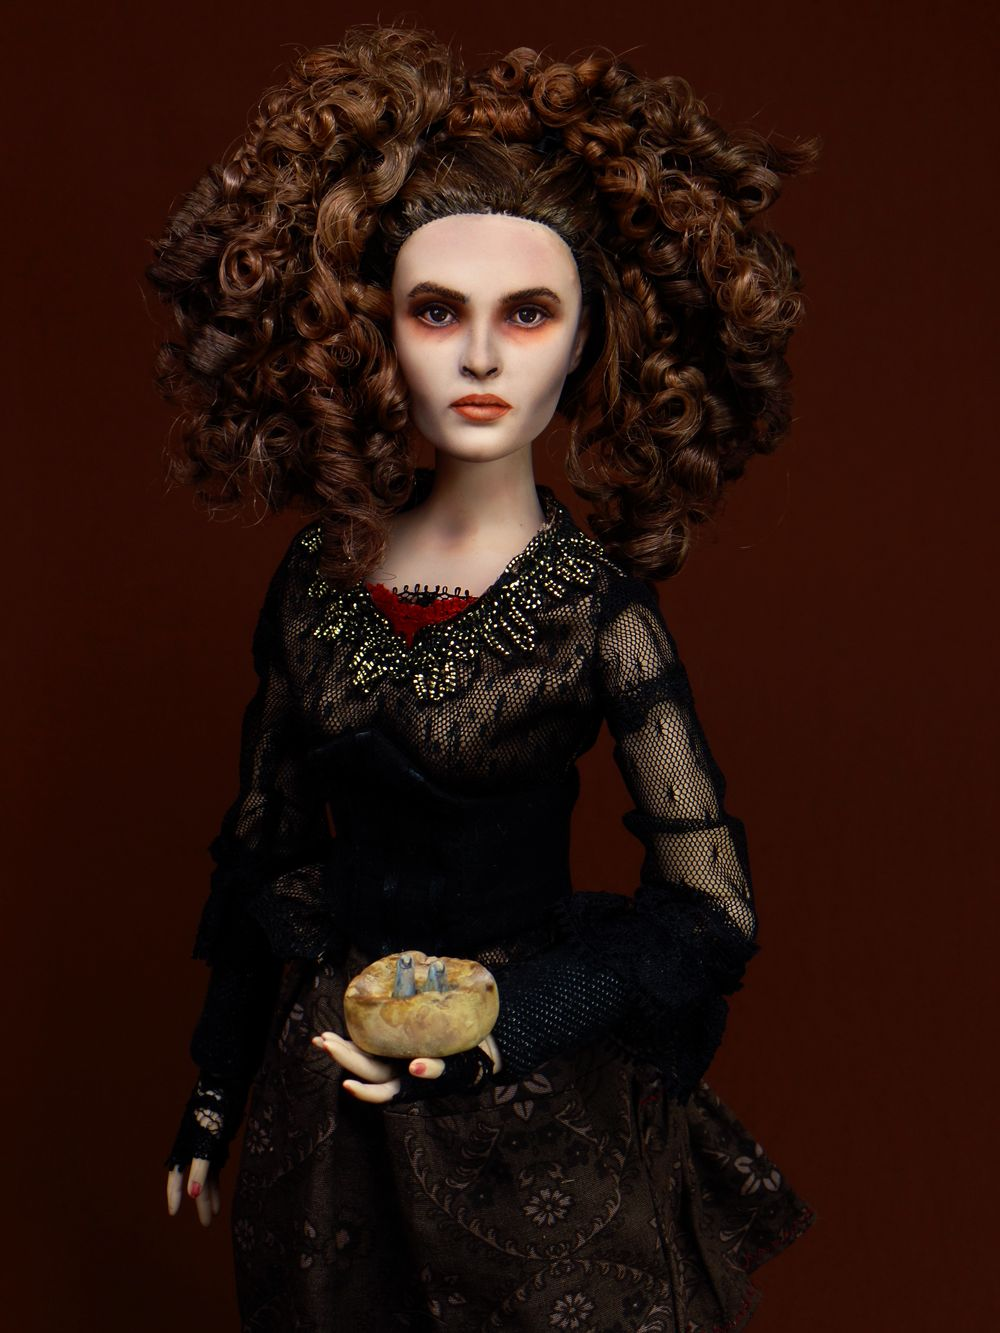 Sweeney Todd The Butcher Of Fleet Street Custom Tonner Doll Mrs Lovett By Laurie Leigh Costume By Morgan May Sweeney Todd Fleet Street Laurie